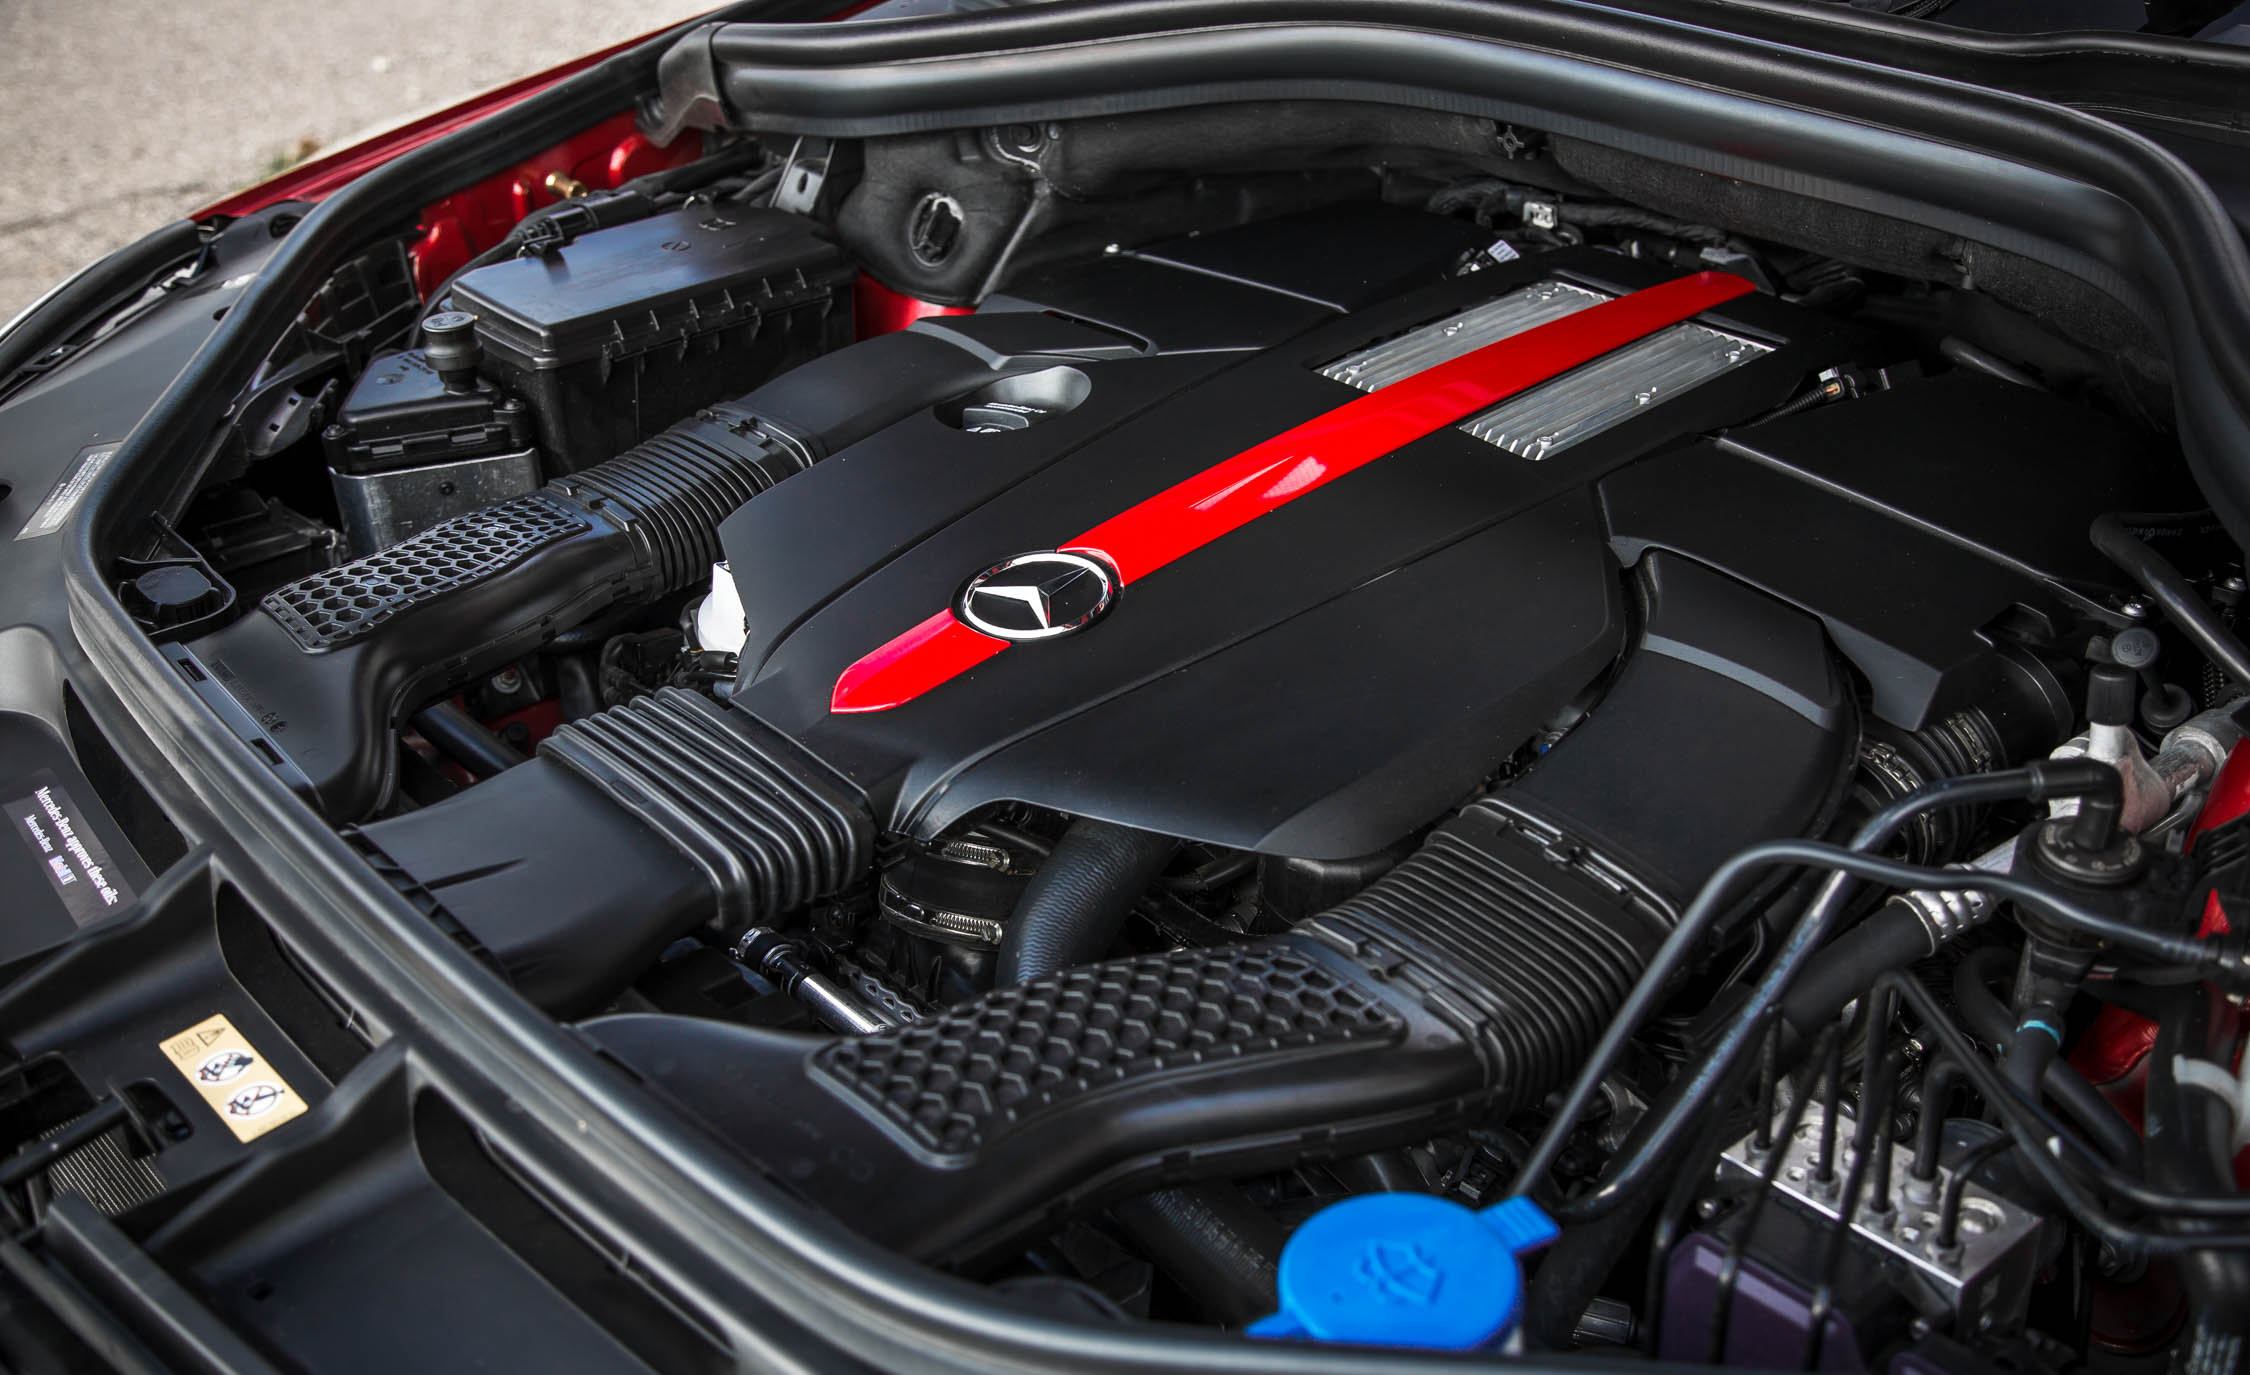 2016 Mercedes-Benz GLE450 AMG Coupe Engine Twin-Turbocharged 3.0-liter V-6